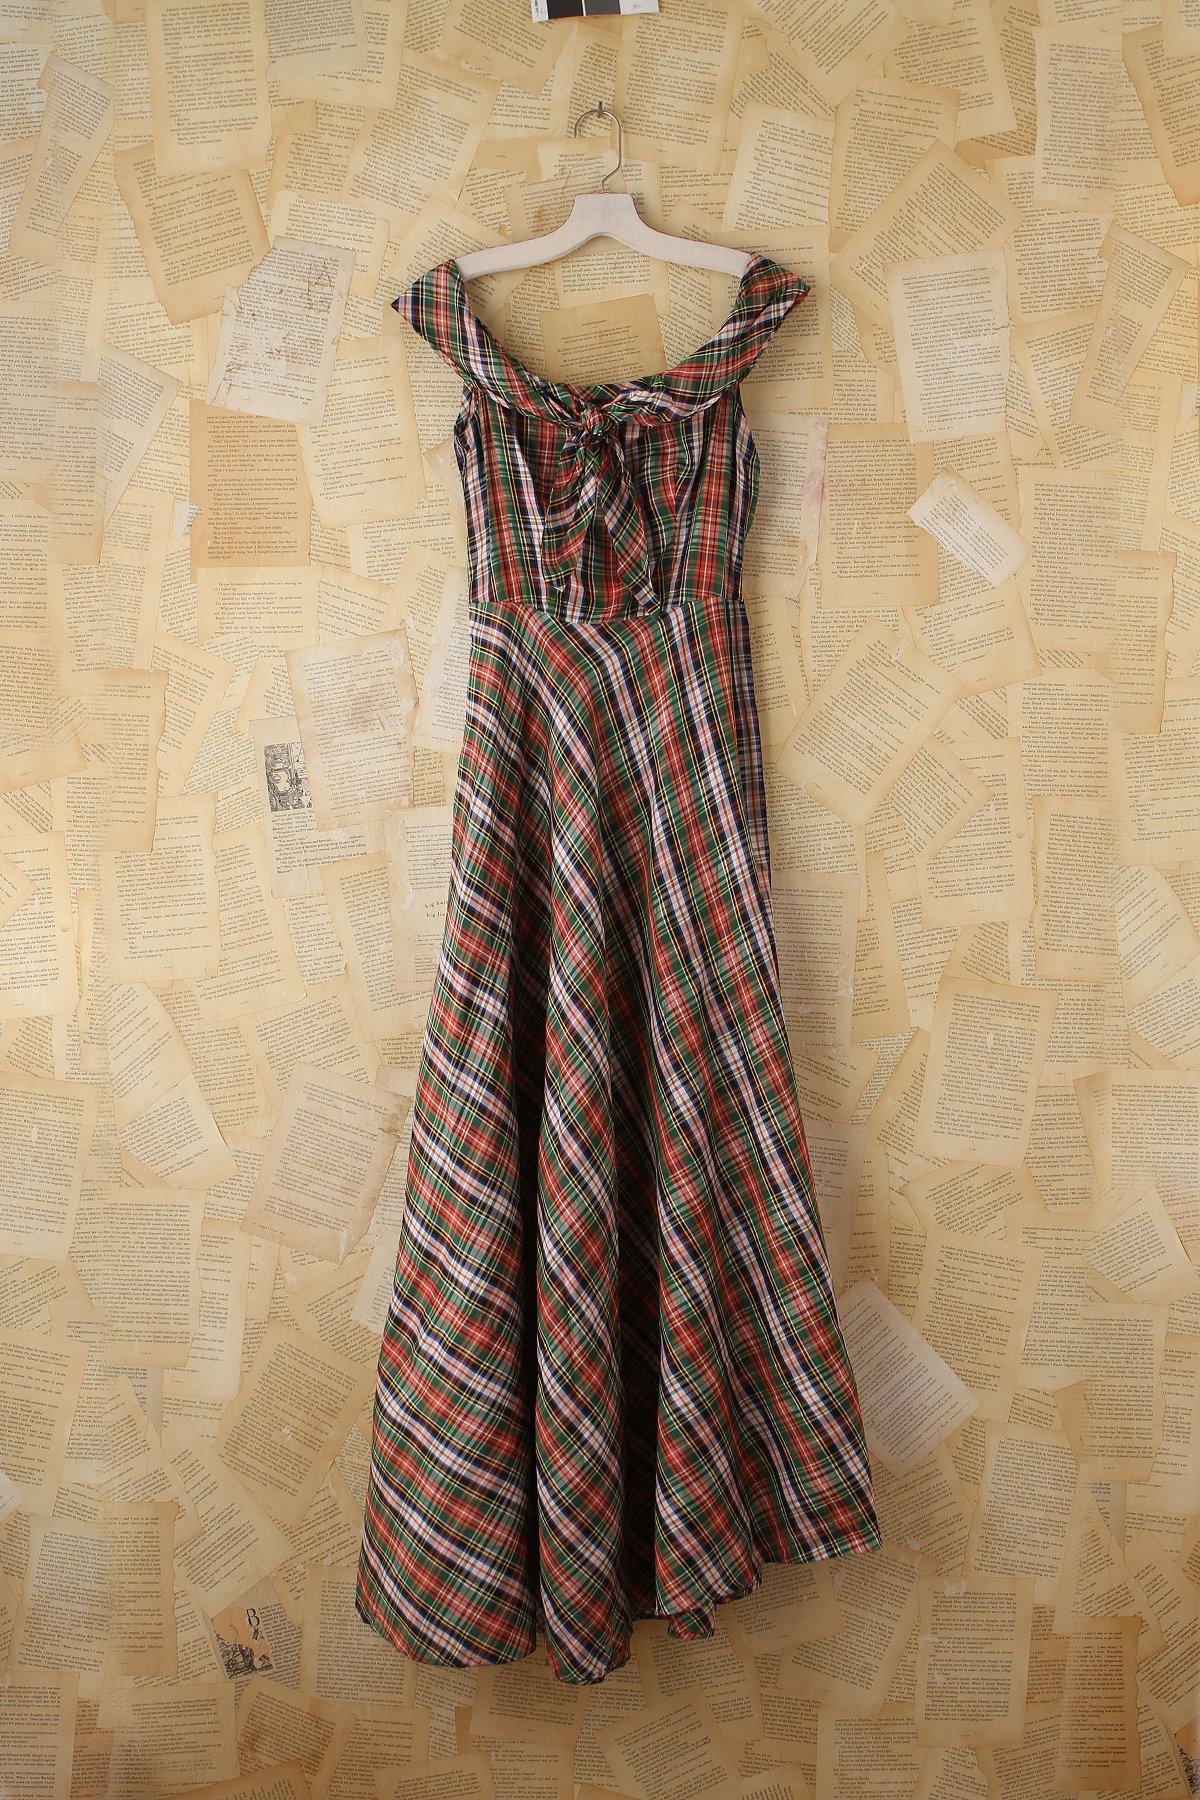 Vintage Plaid Taffeta Dress